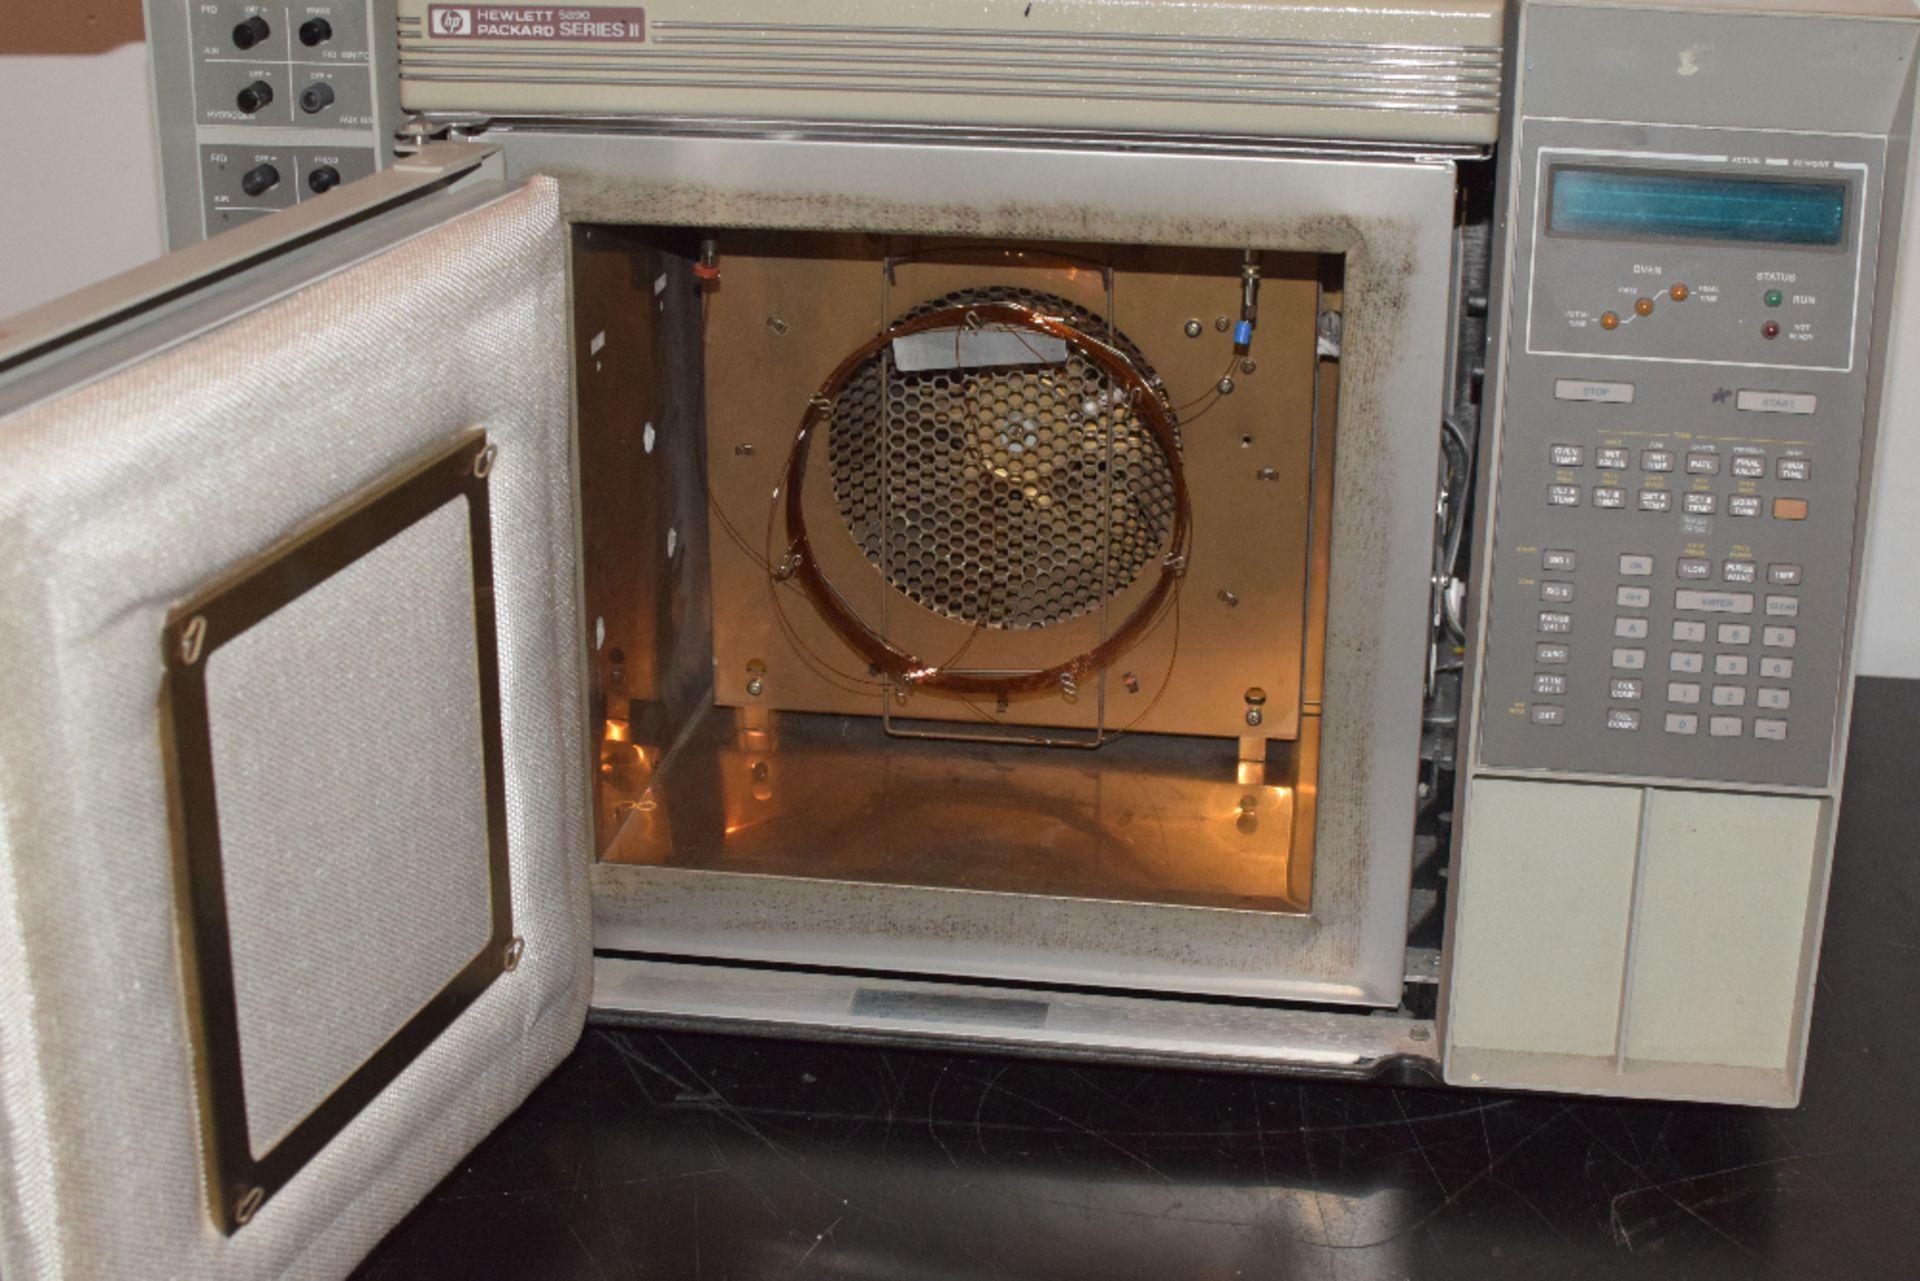 Hewlett Packard 5890 Series II Gas Chromatograph - Image 3 of 4